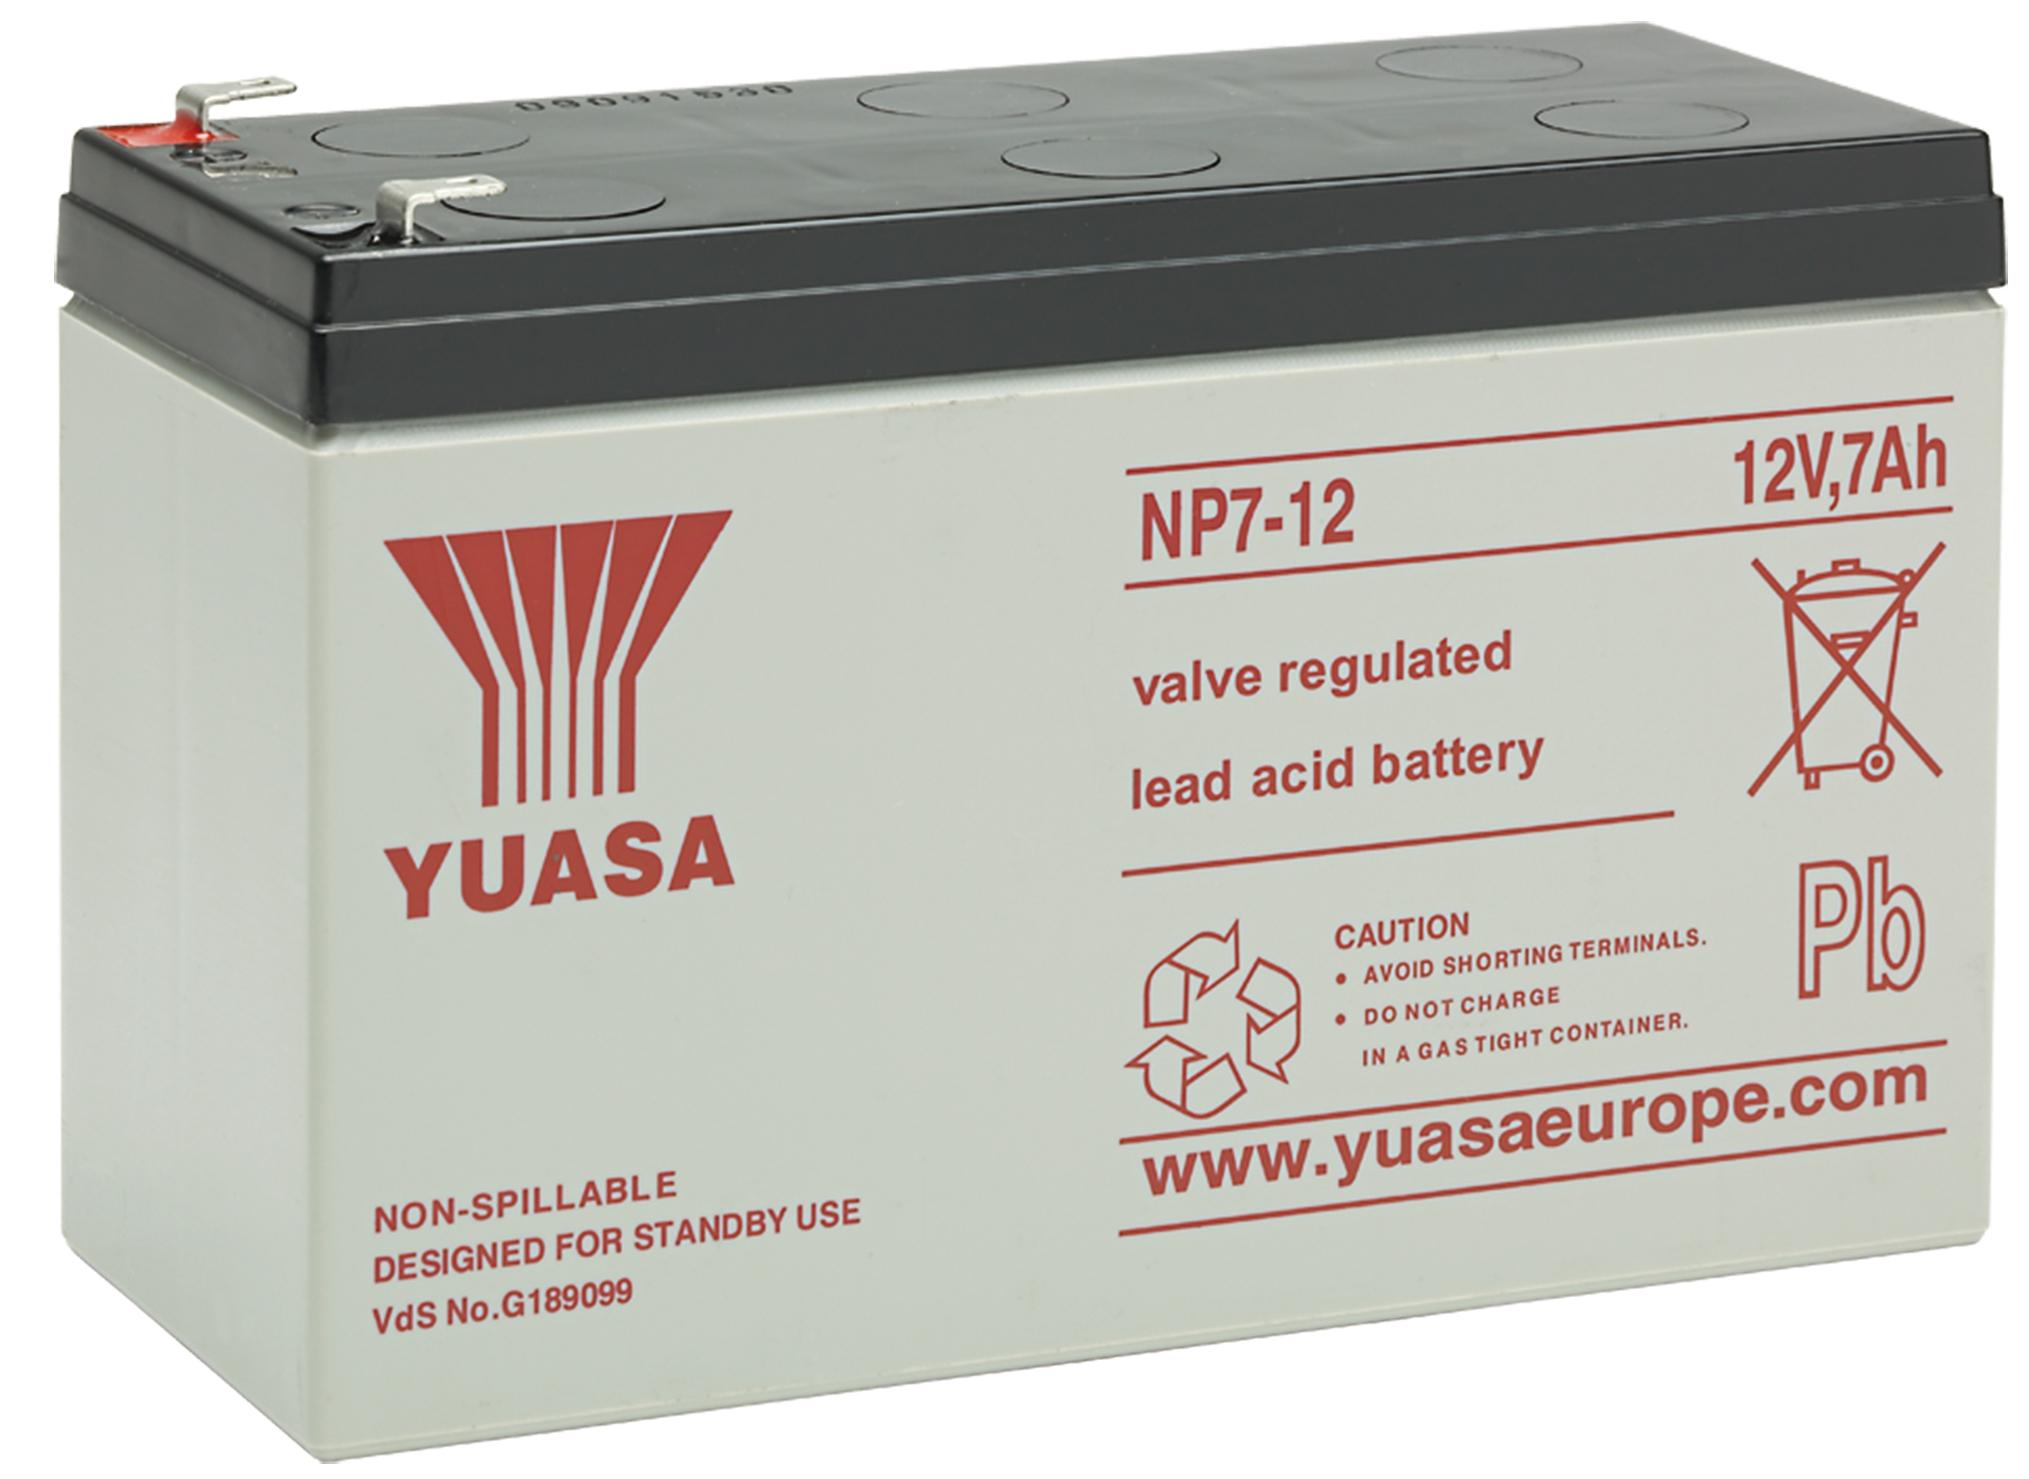 12V/7Ah Yuasa Blybatteri NP7-12